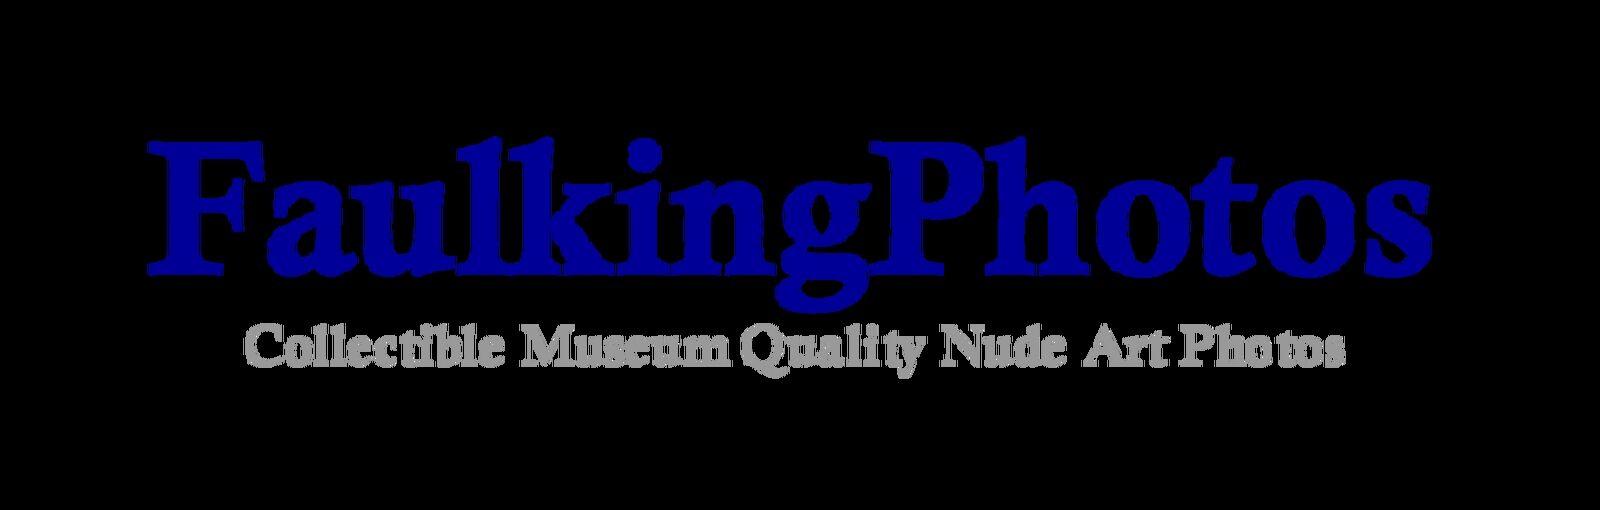 faulkingphotos